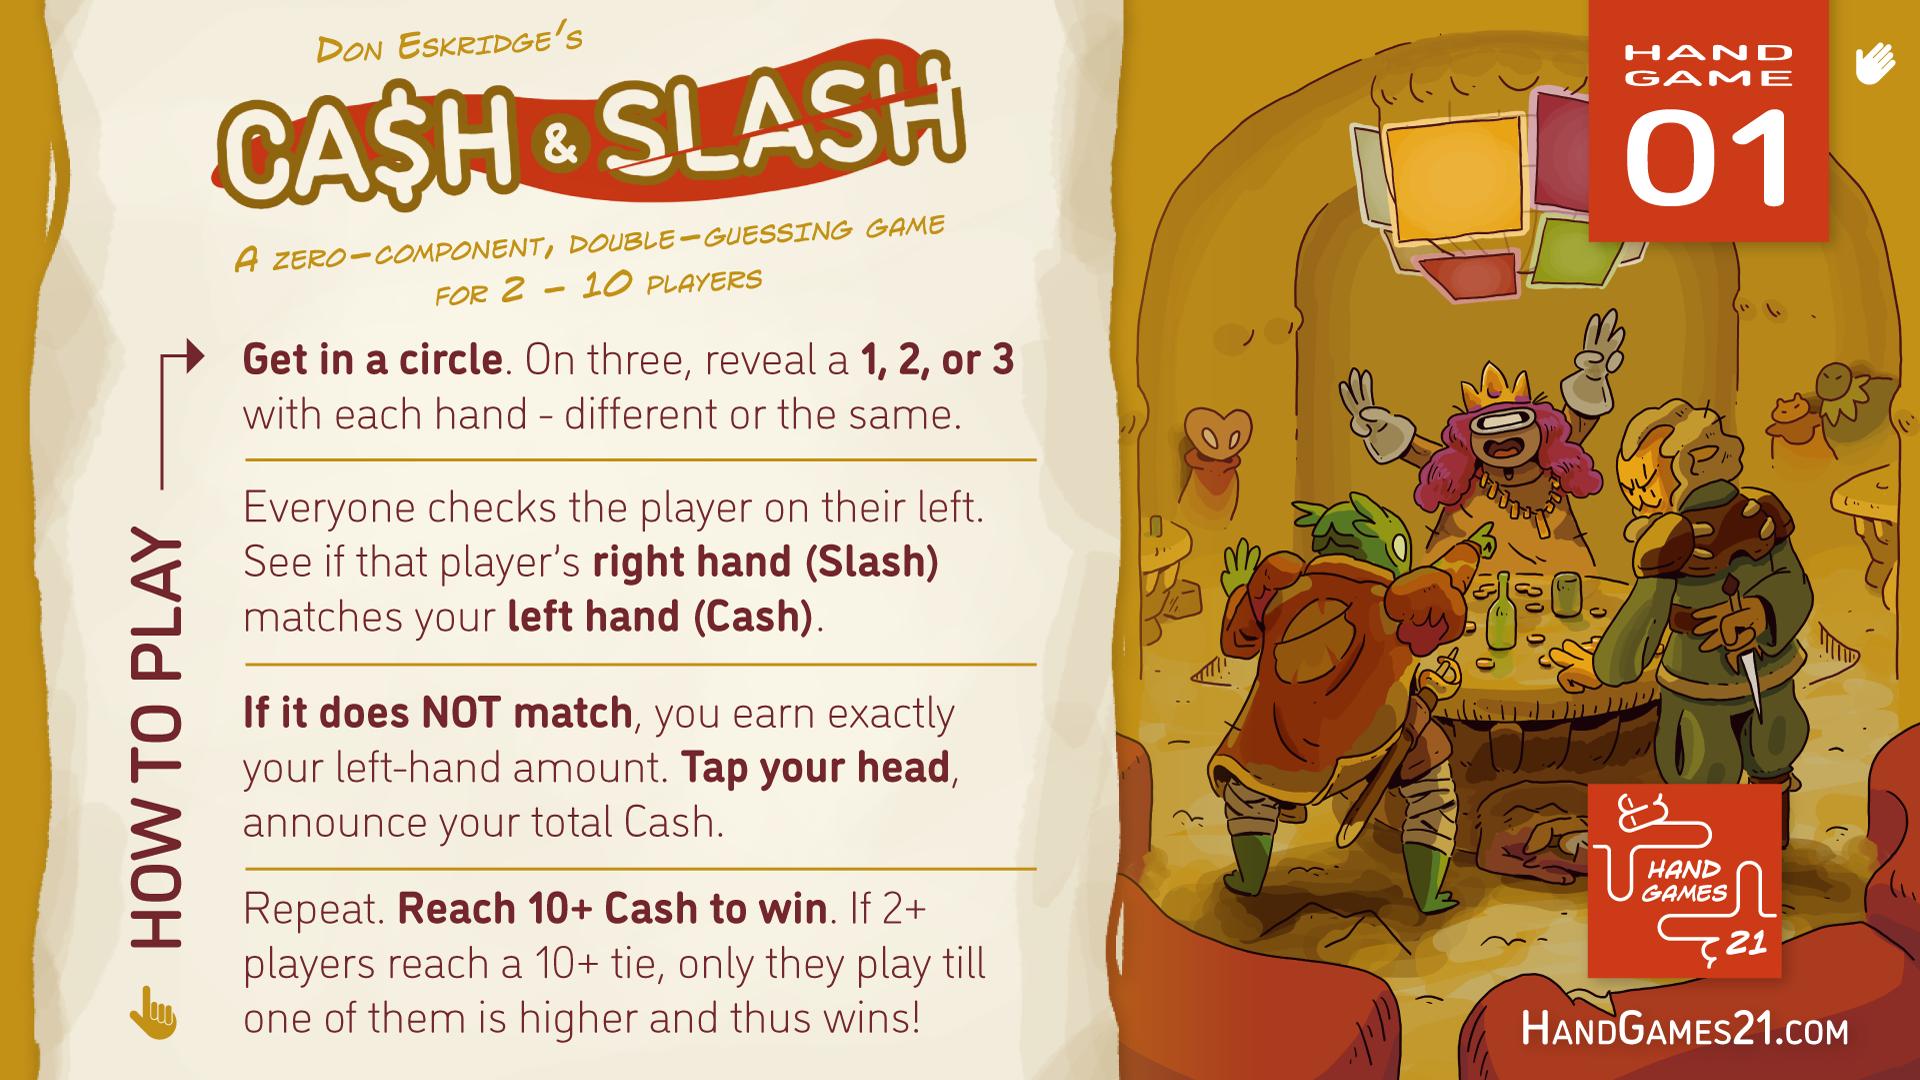 Hand Games 21 Cash and Slash